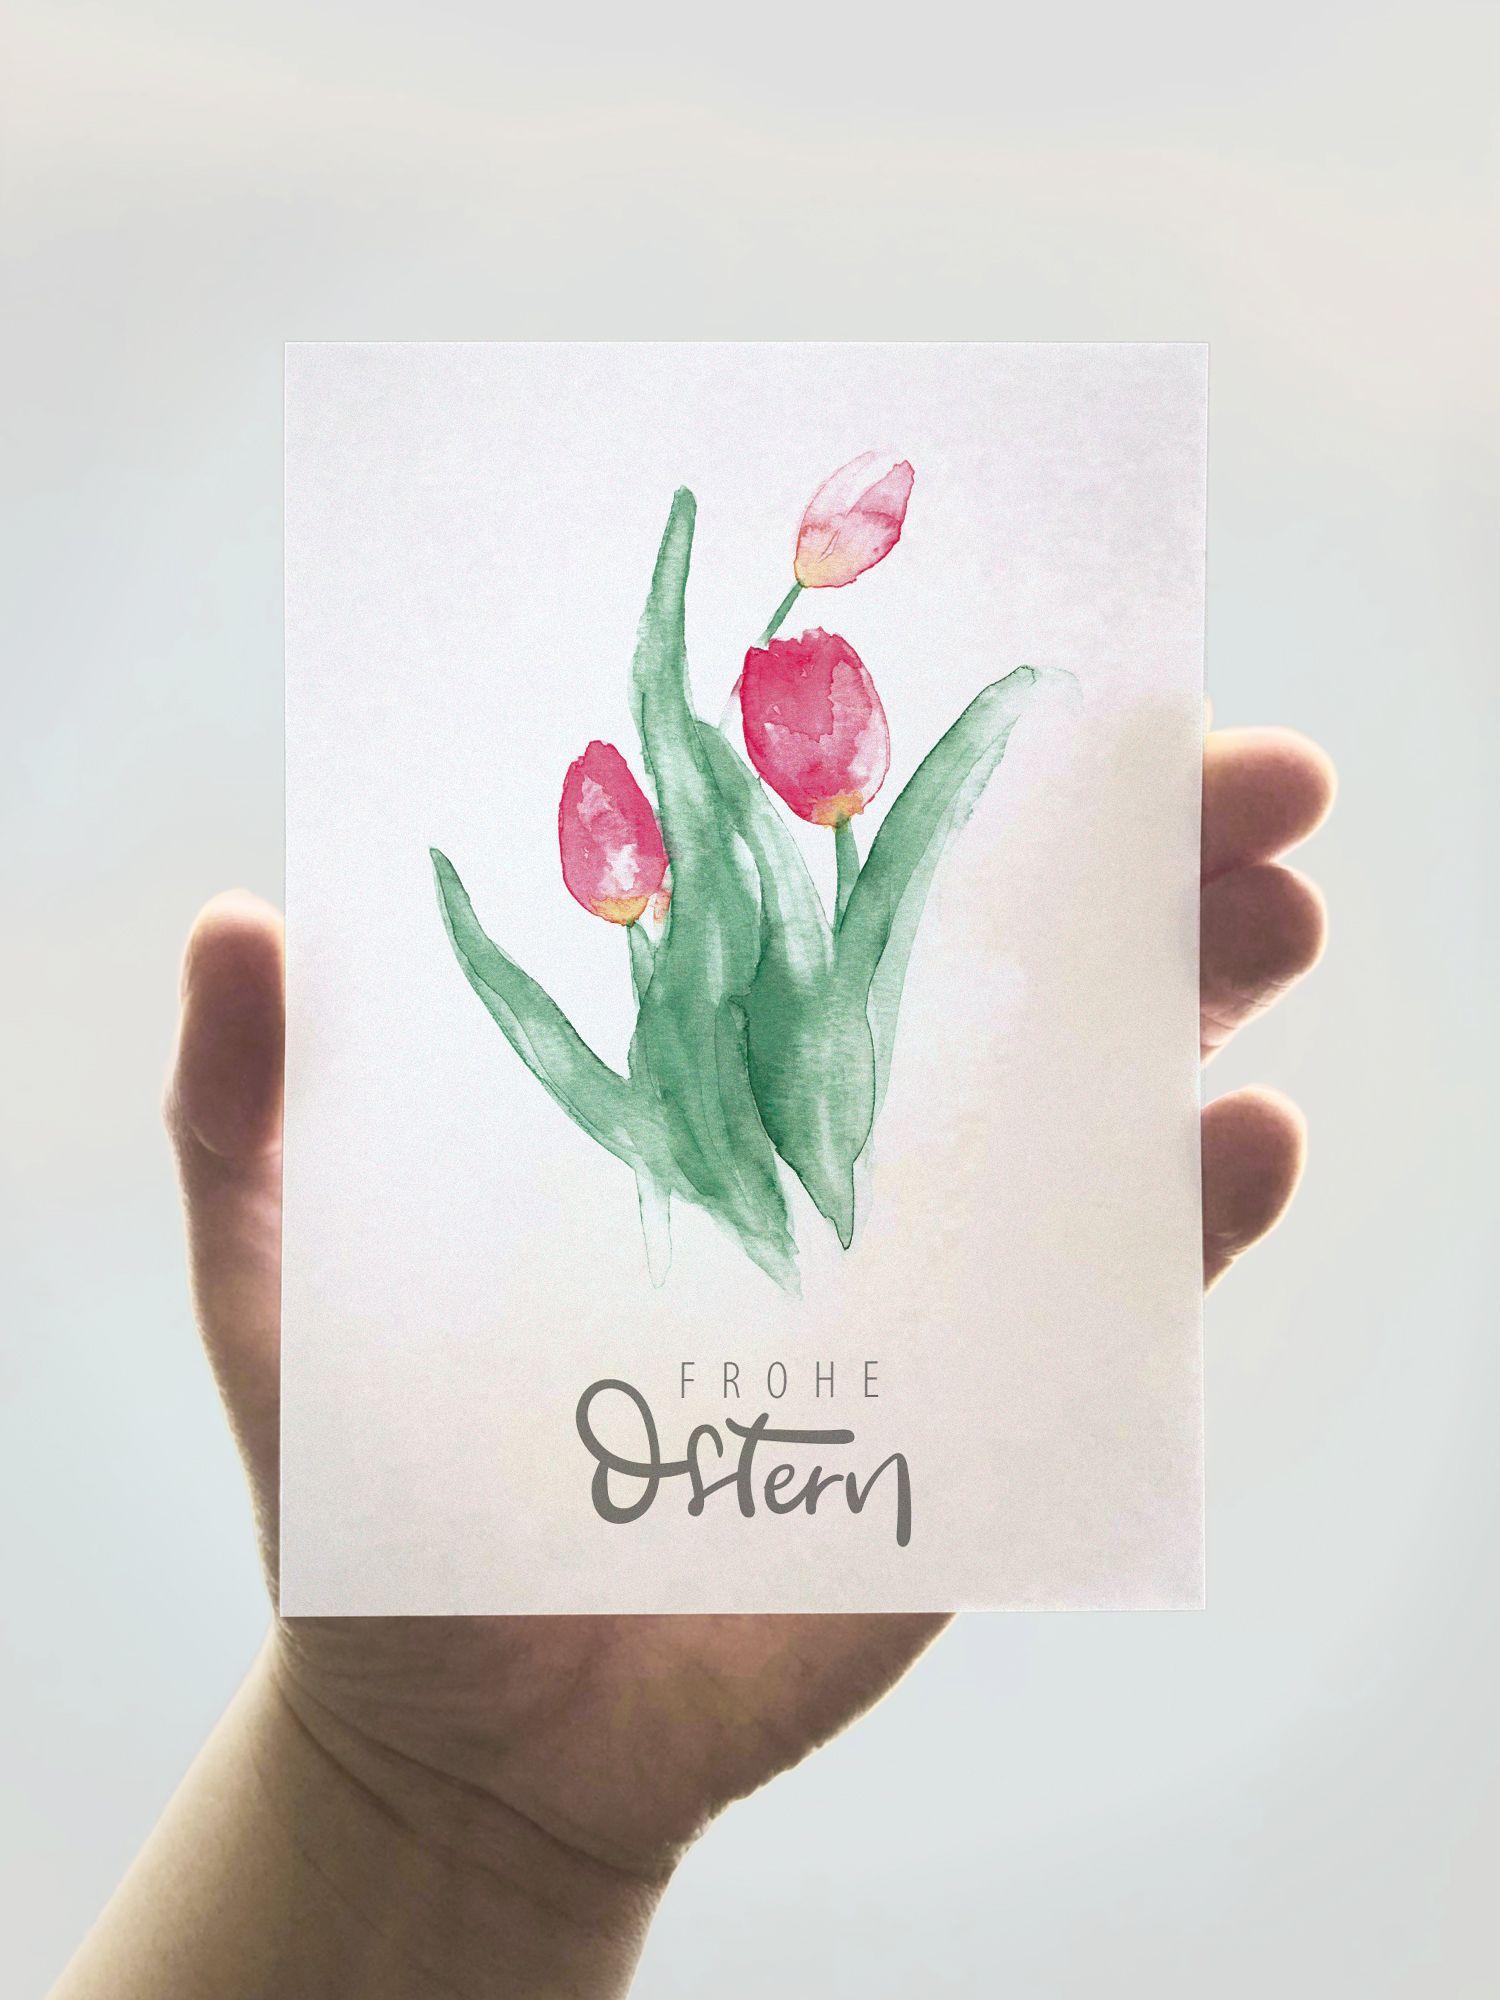 A6 Klappkarte Frohe Ostern mit Tulpen Illustration und Handlettering